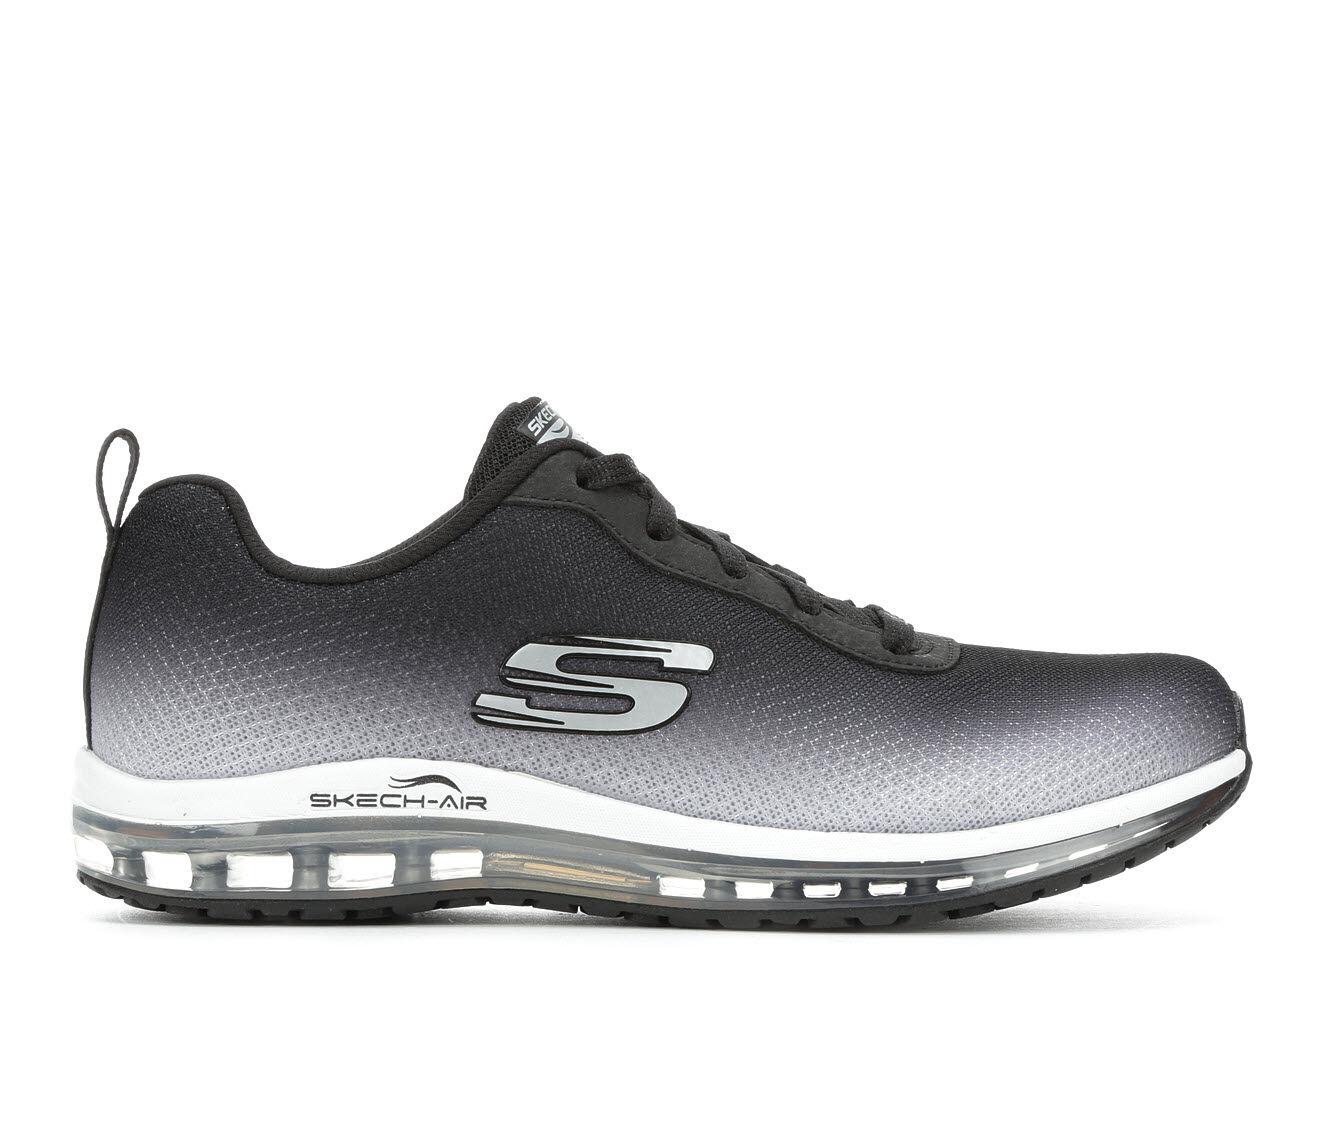 uk shoes_kd4591